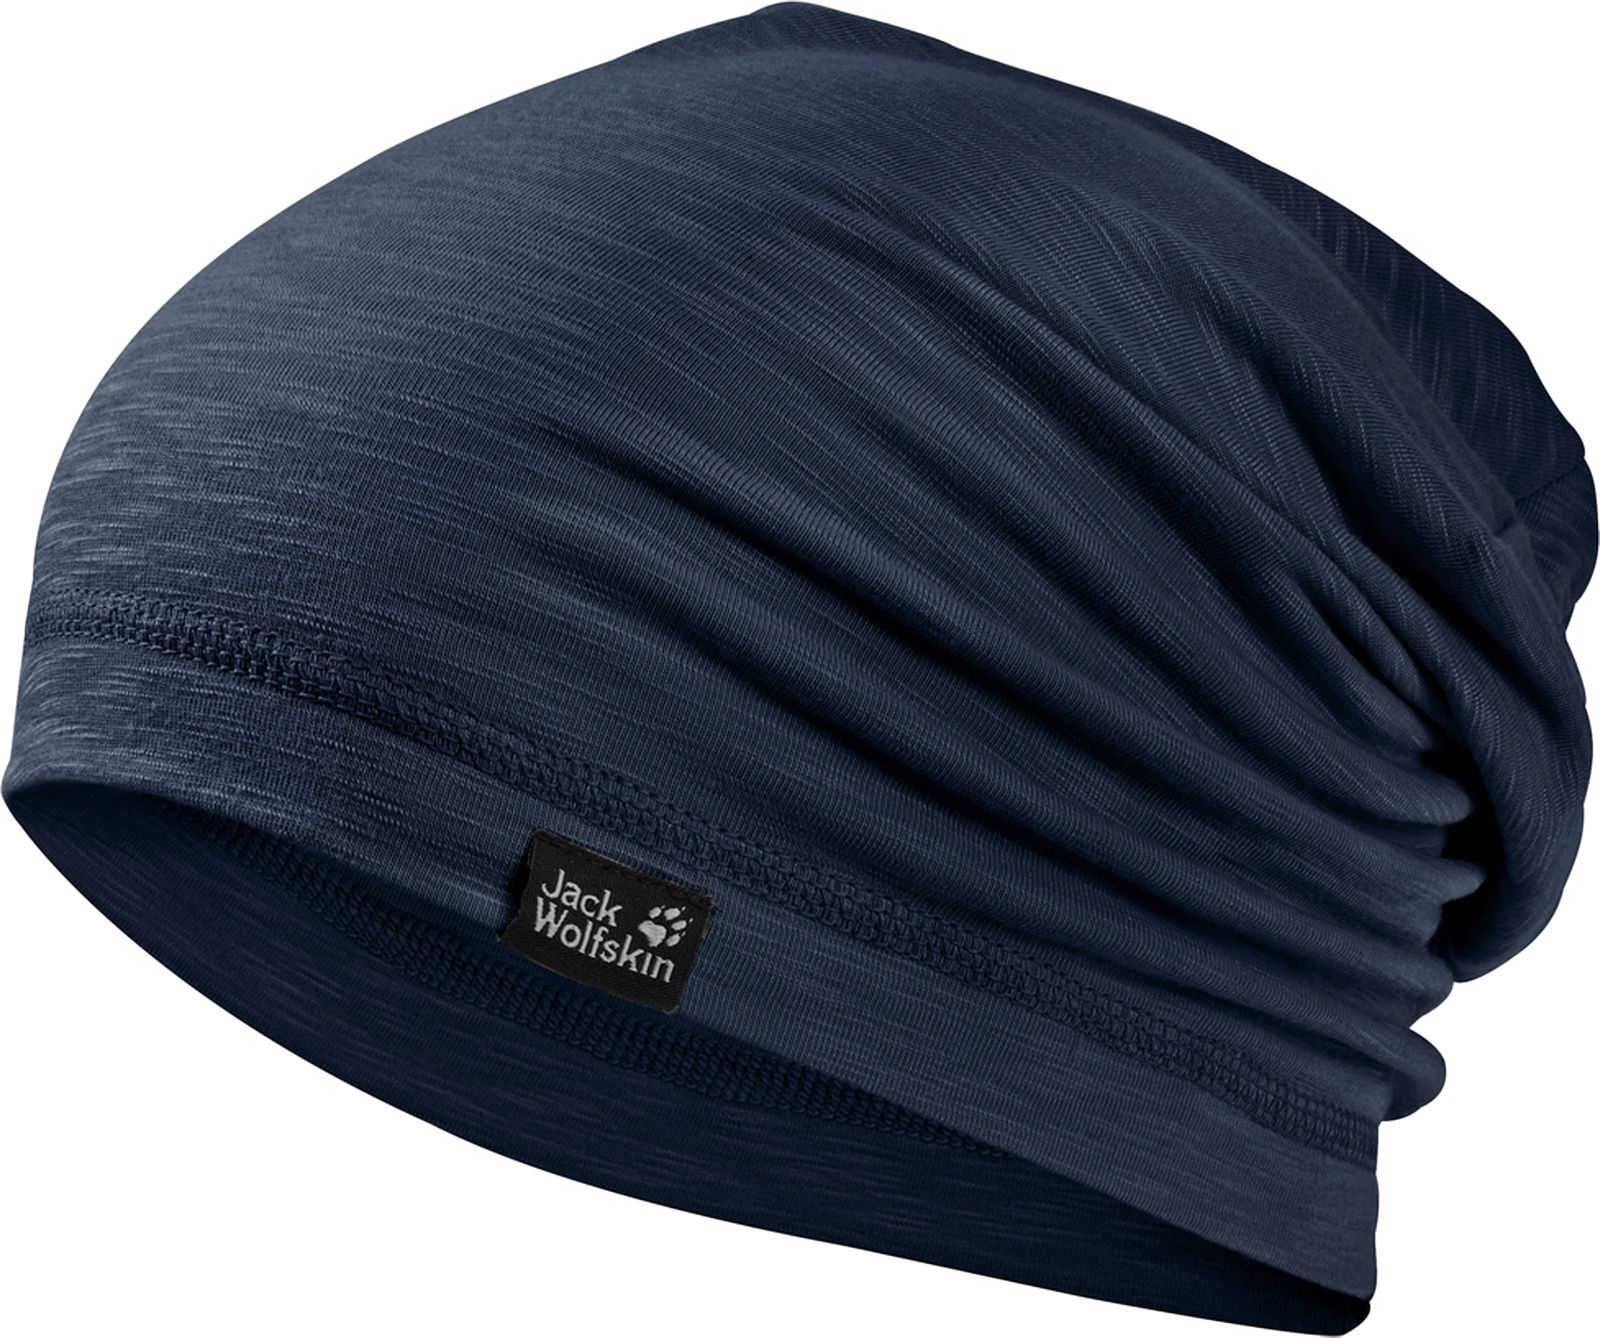 Шапка Jack Wolfskin Travel Beanie, цвет: темно-синий. 1905601-1010. Размер 55/59 шапка jack wolfskin jack wolfskin ja021cukhp70